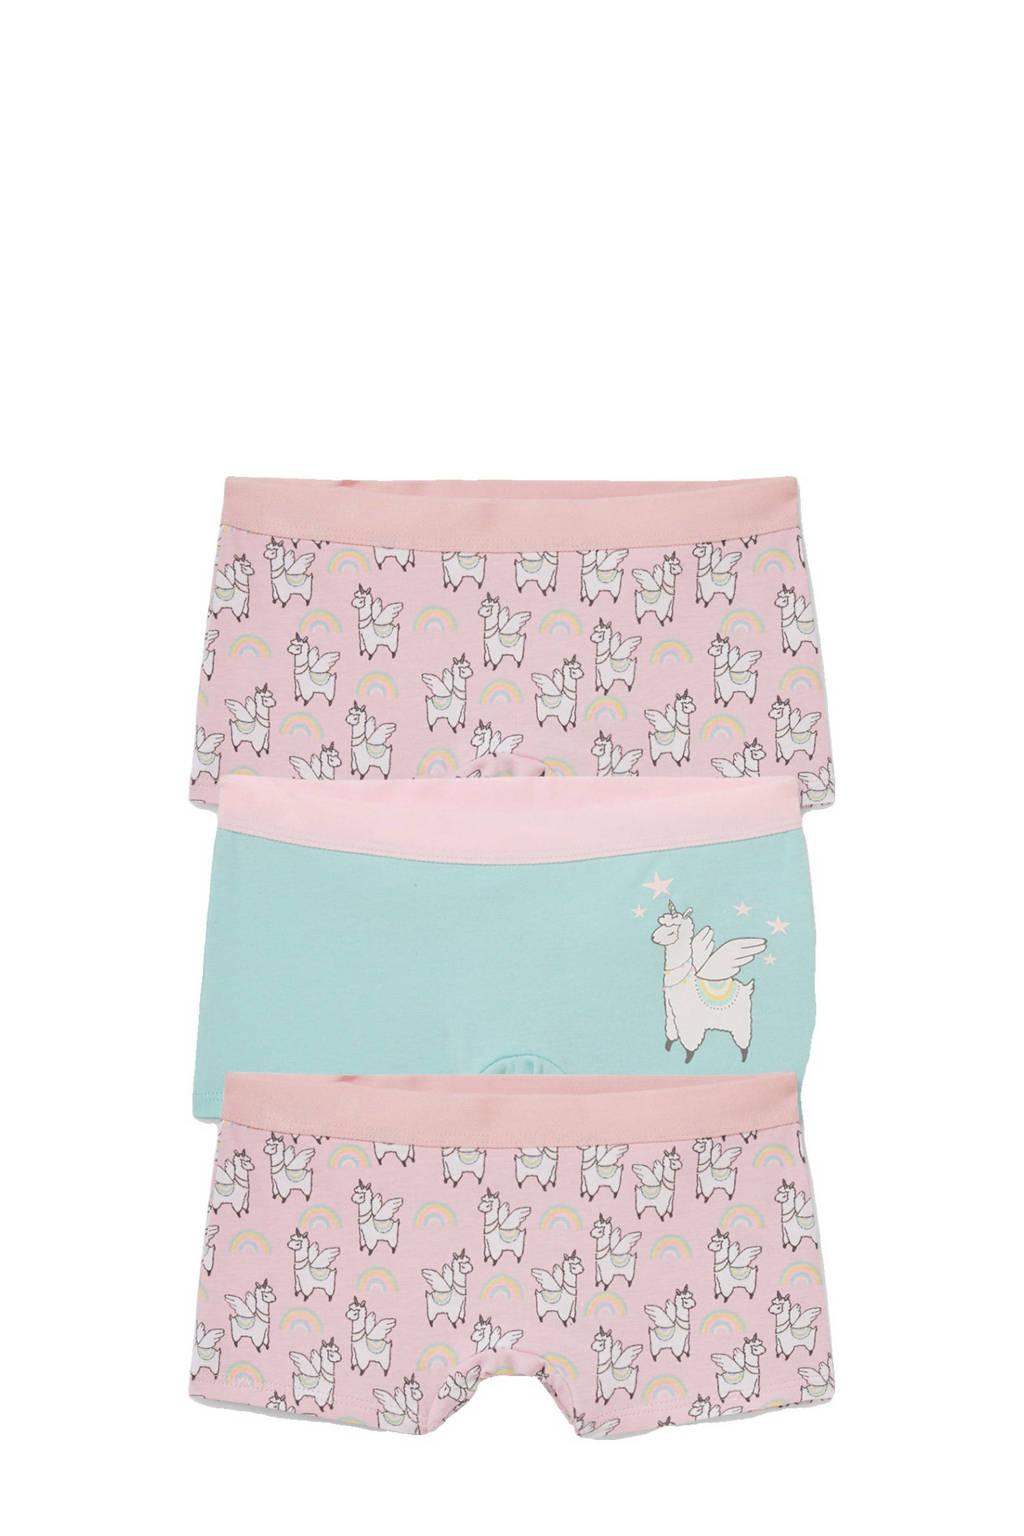 C&A Palomino short - set van 3 met print roze/turquoise, Roze